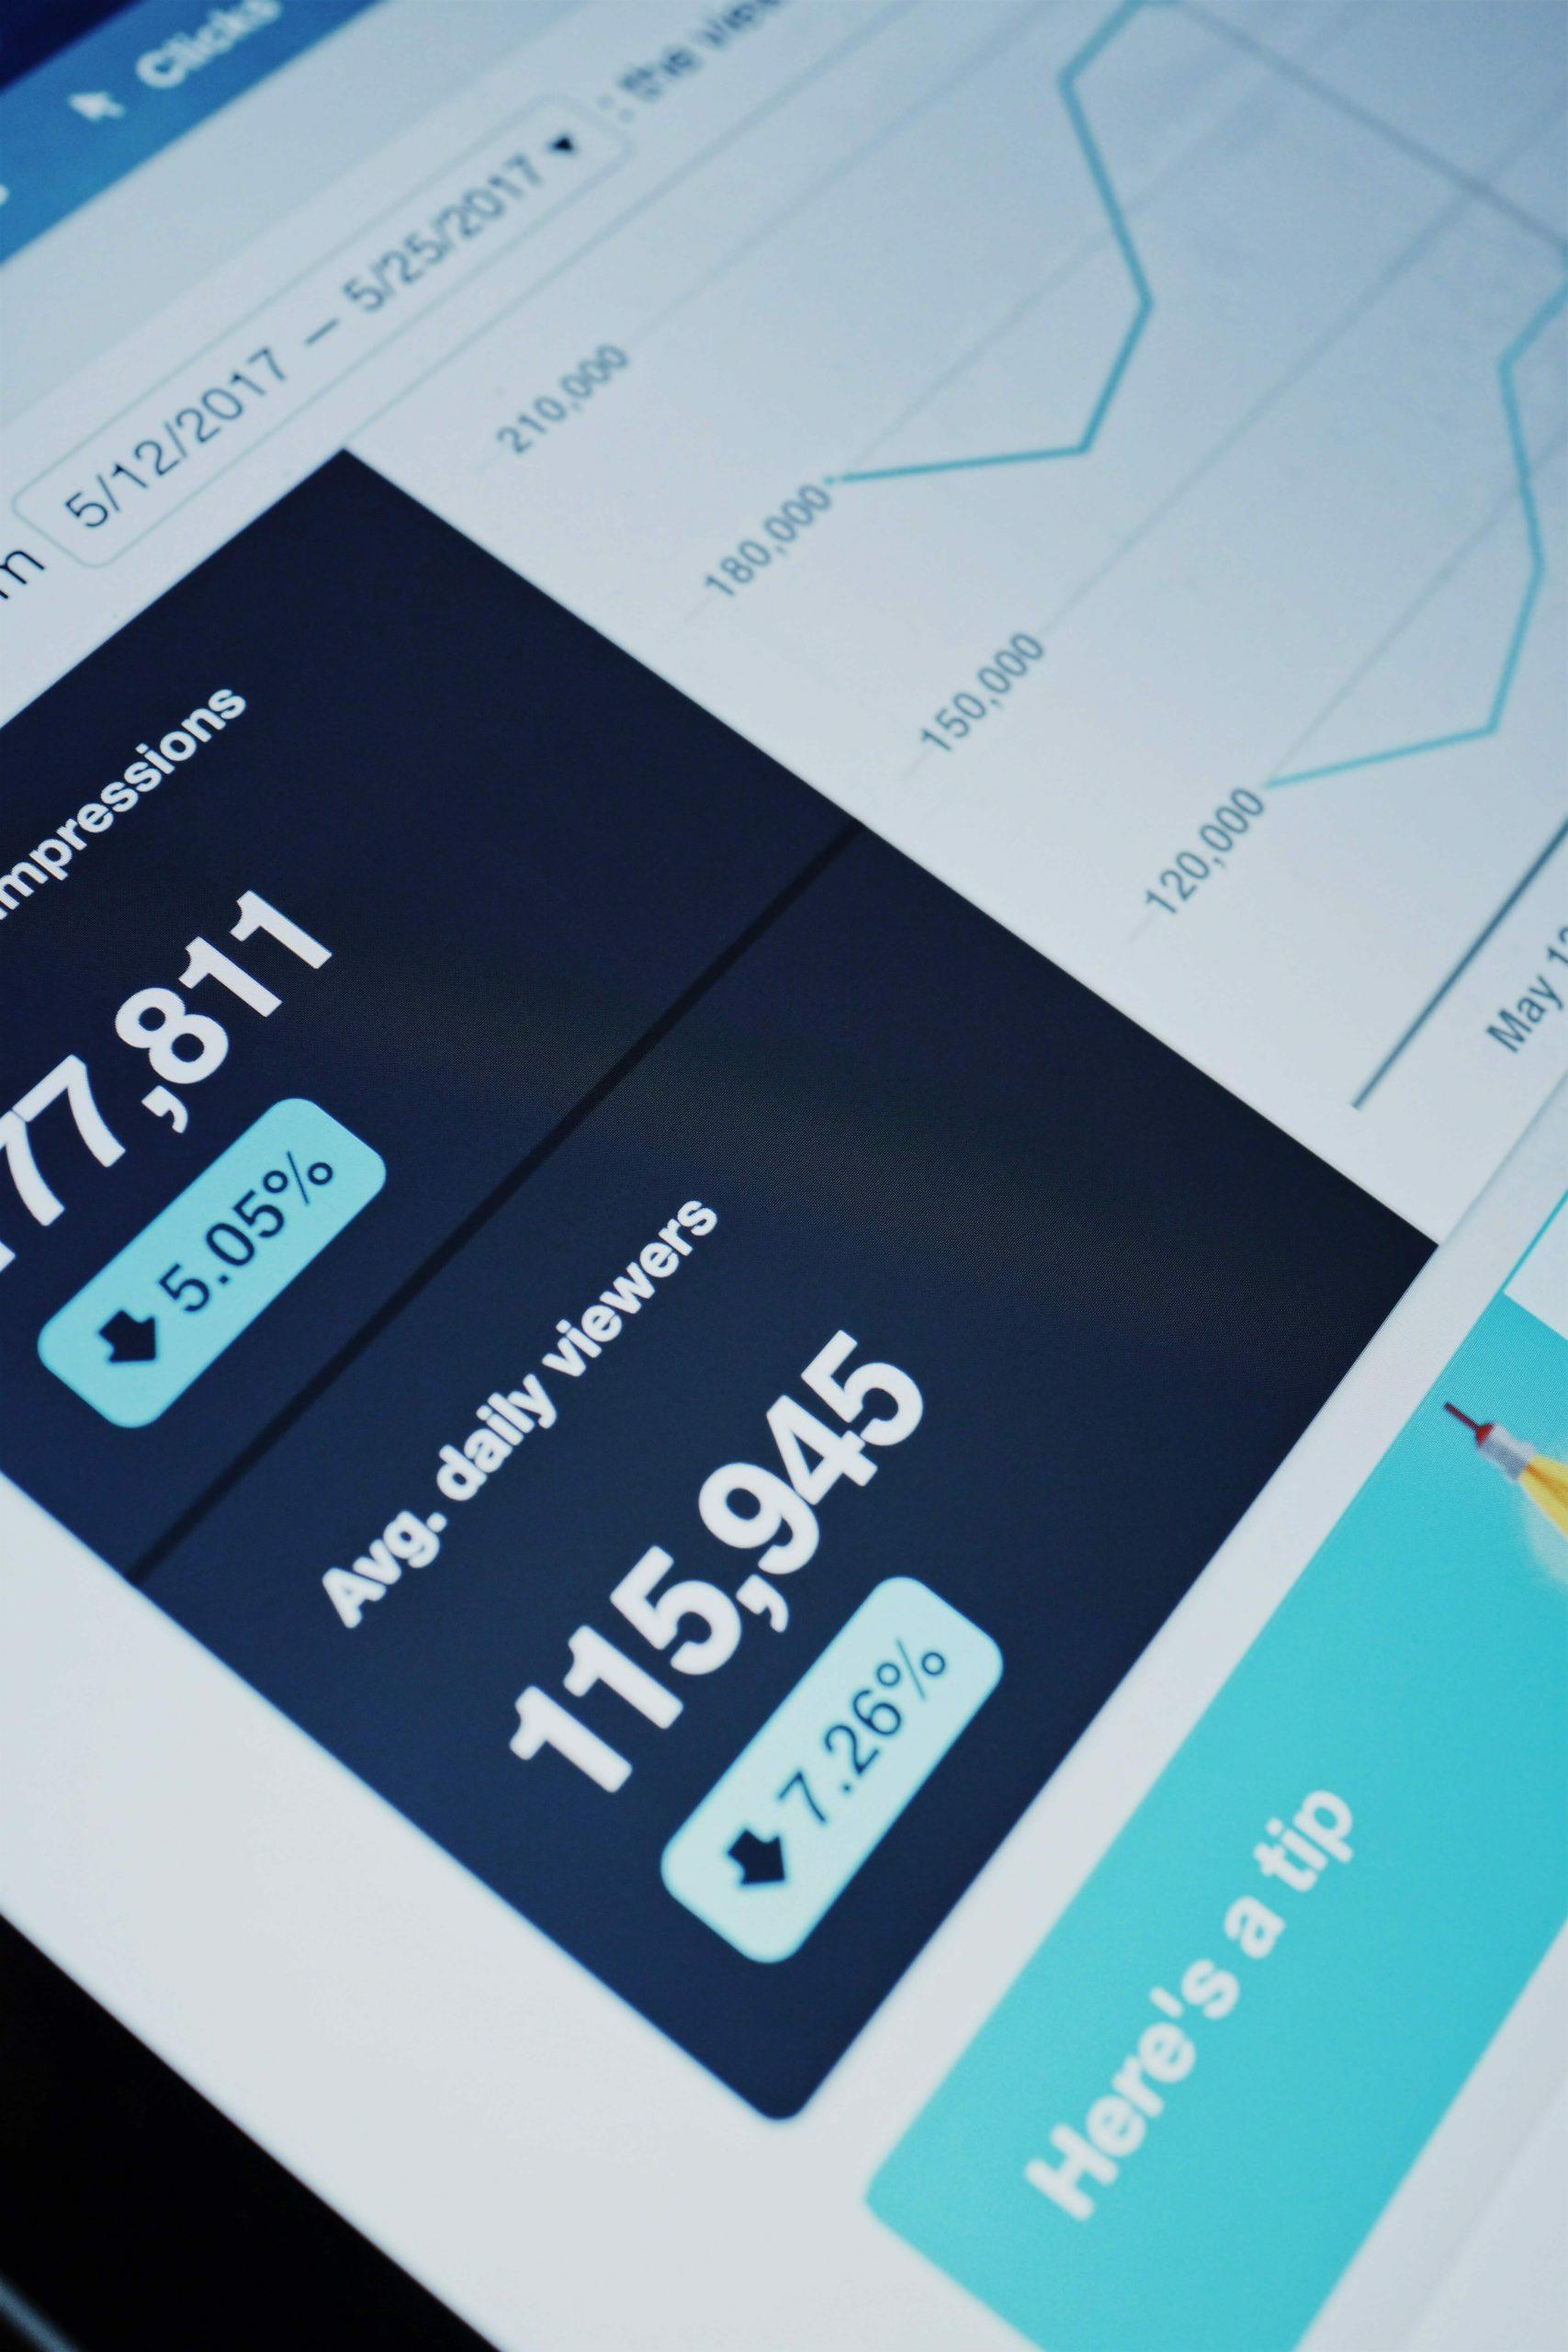 Free Instagram Analytics Tool (Wolf Analytics)